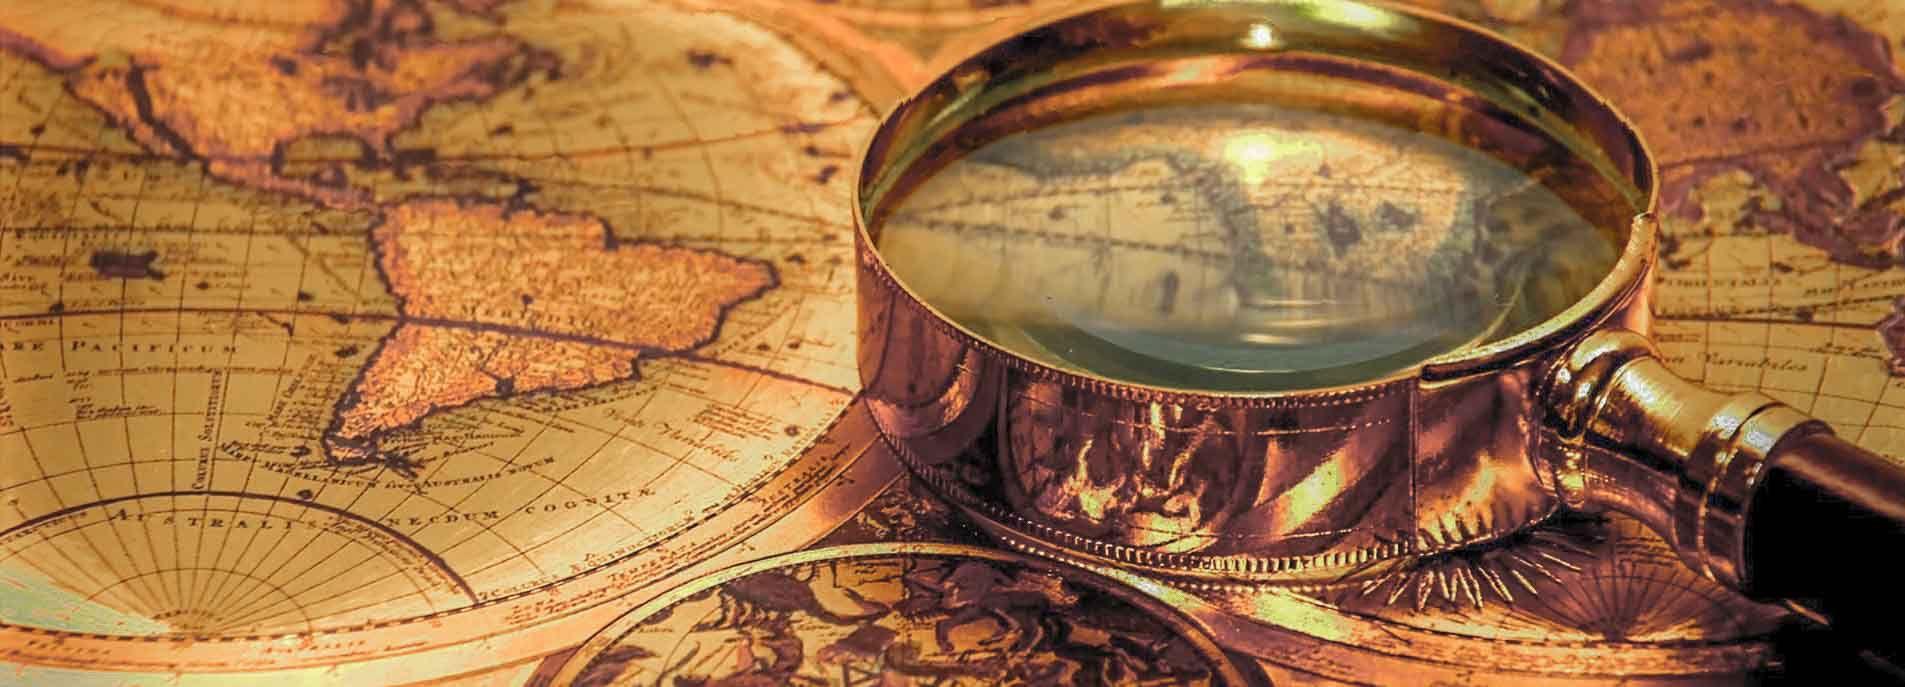 Descuentos - 3000km-Viajes-Aventura-Alternativos-Mochilero-Turismo_Responsable-Grupo